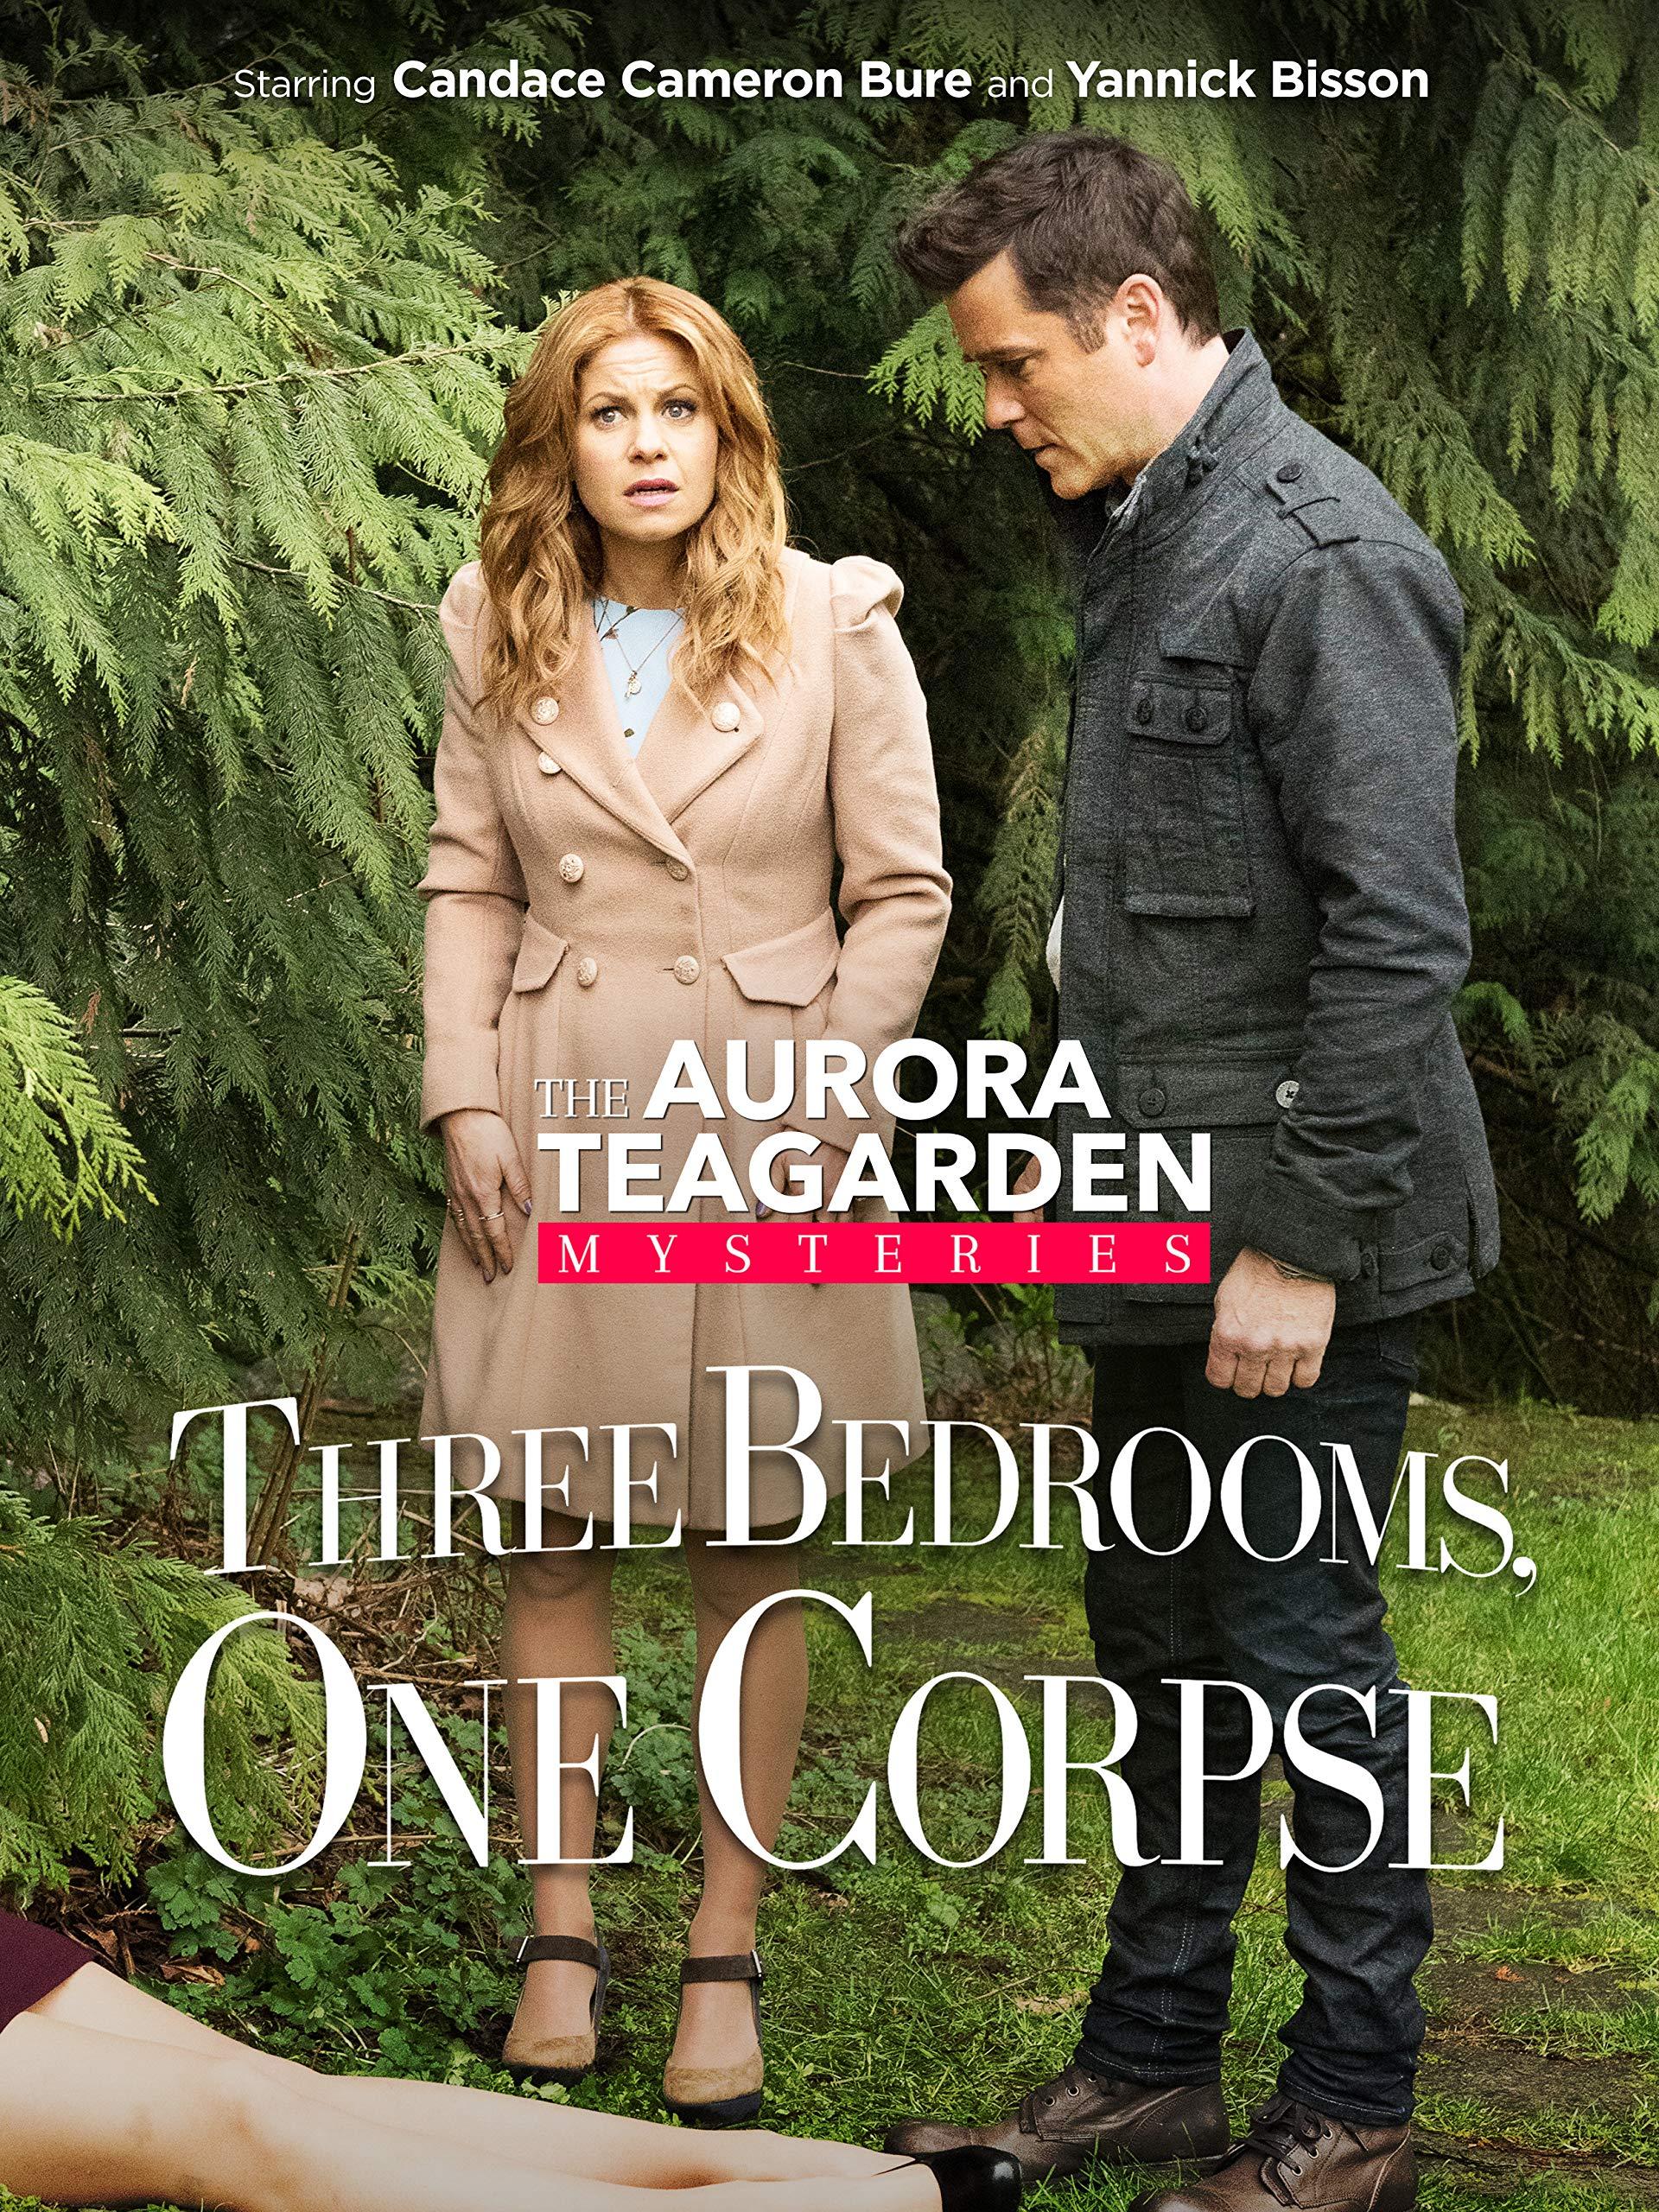 An Aurora Teagarden Mystery: Three Bedrooms, One Corpse